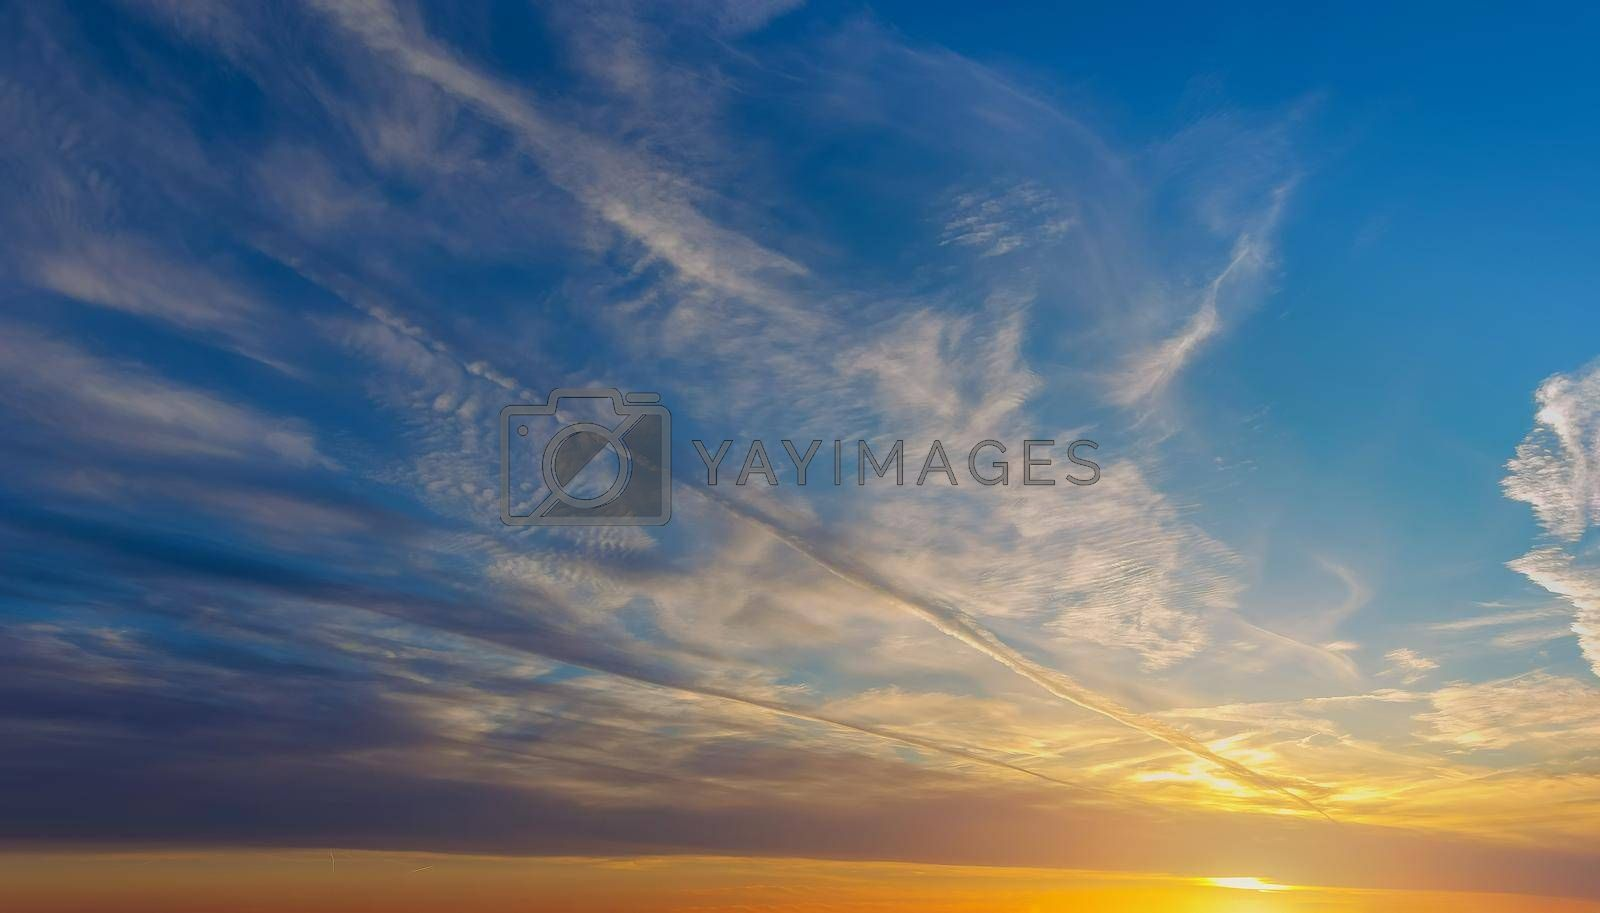 Colorful sky during orange and purple sunset natural landscape